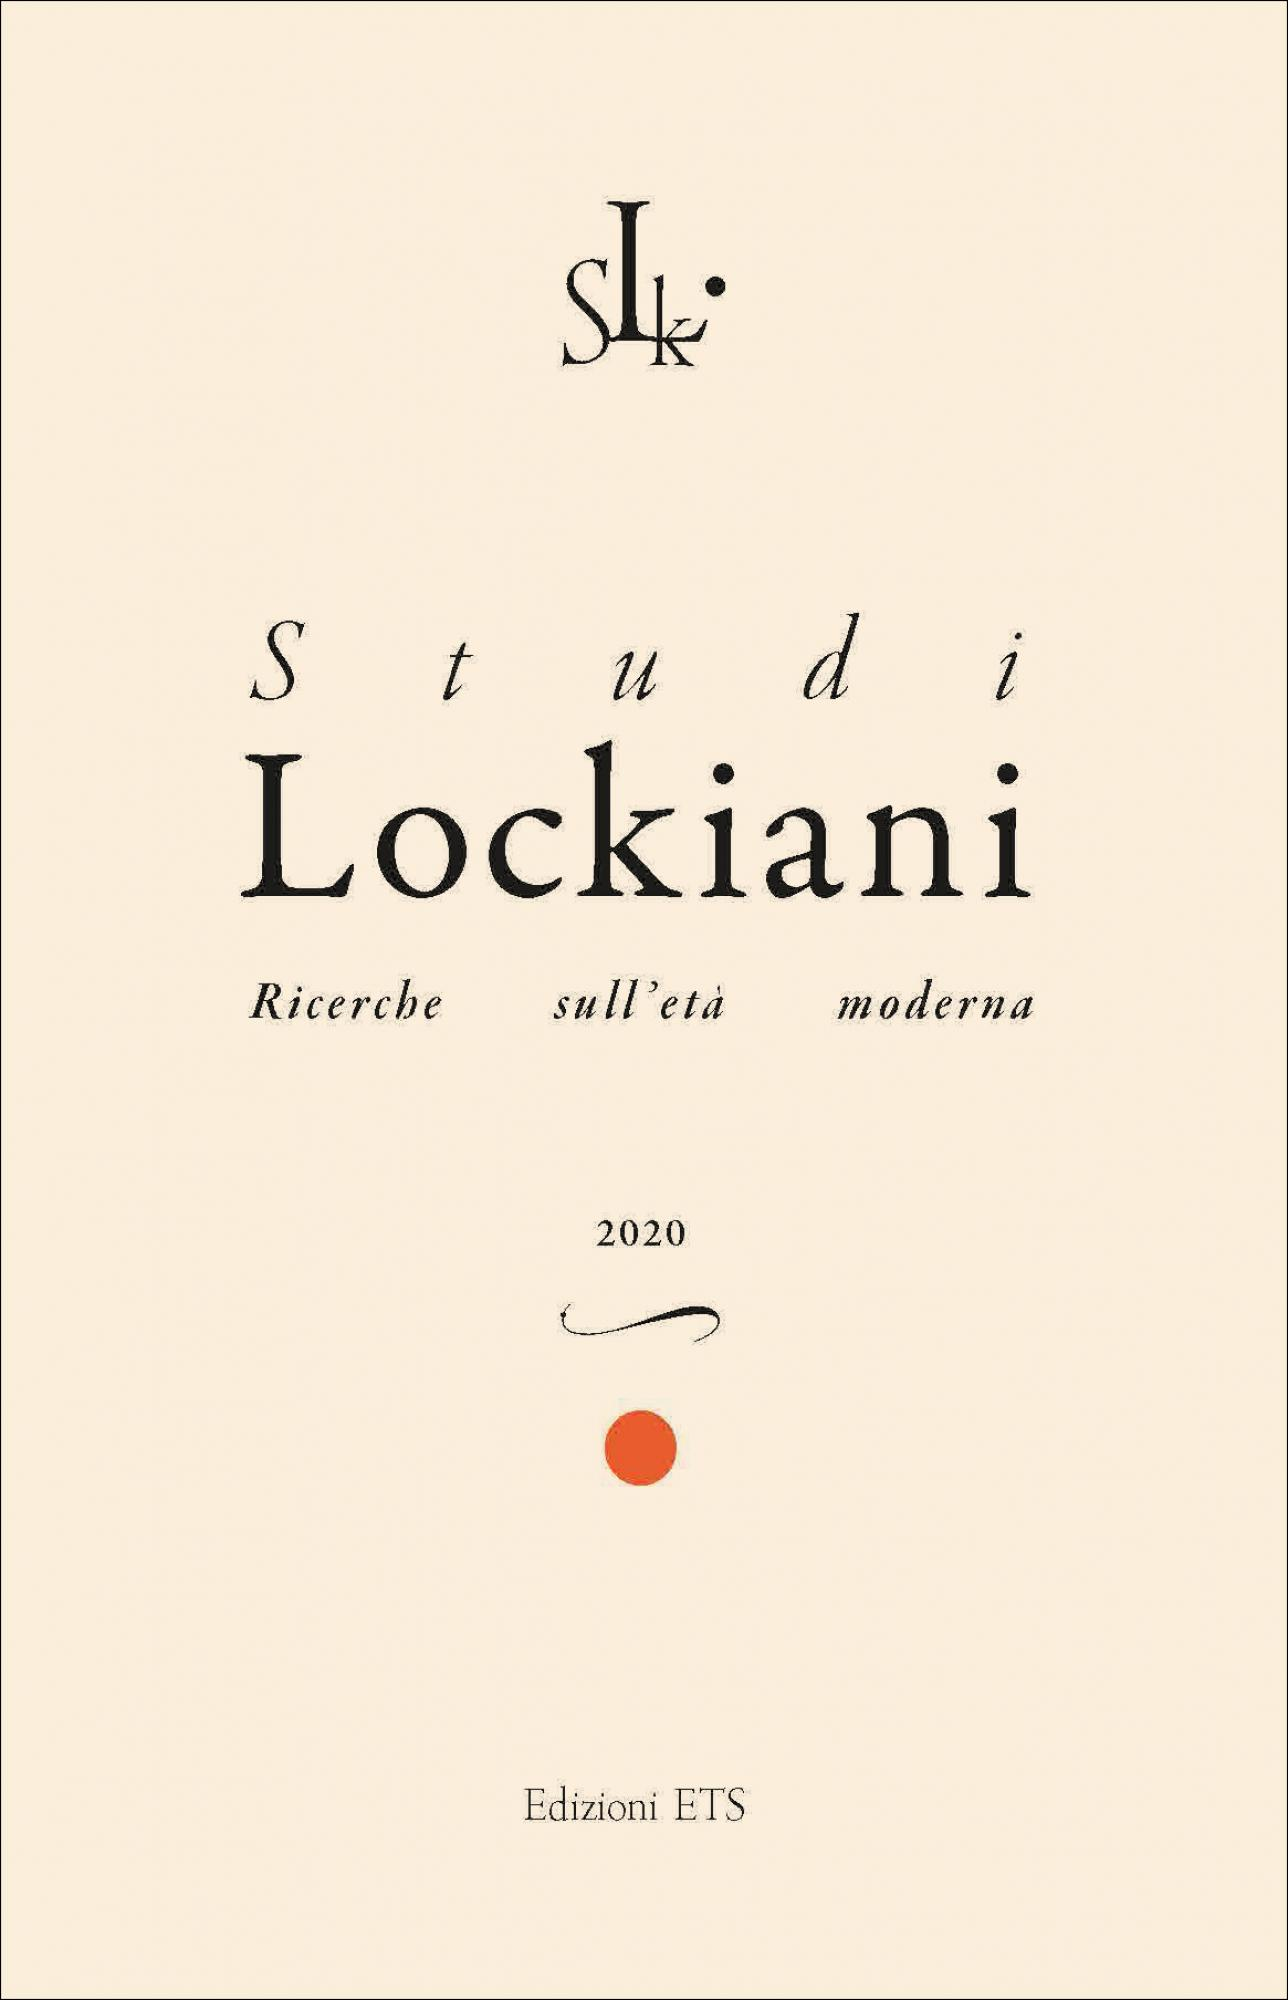 Studi Lockiani 1, 2020.Ricerche sull'età moderna